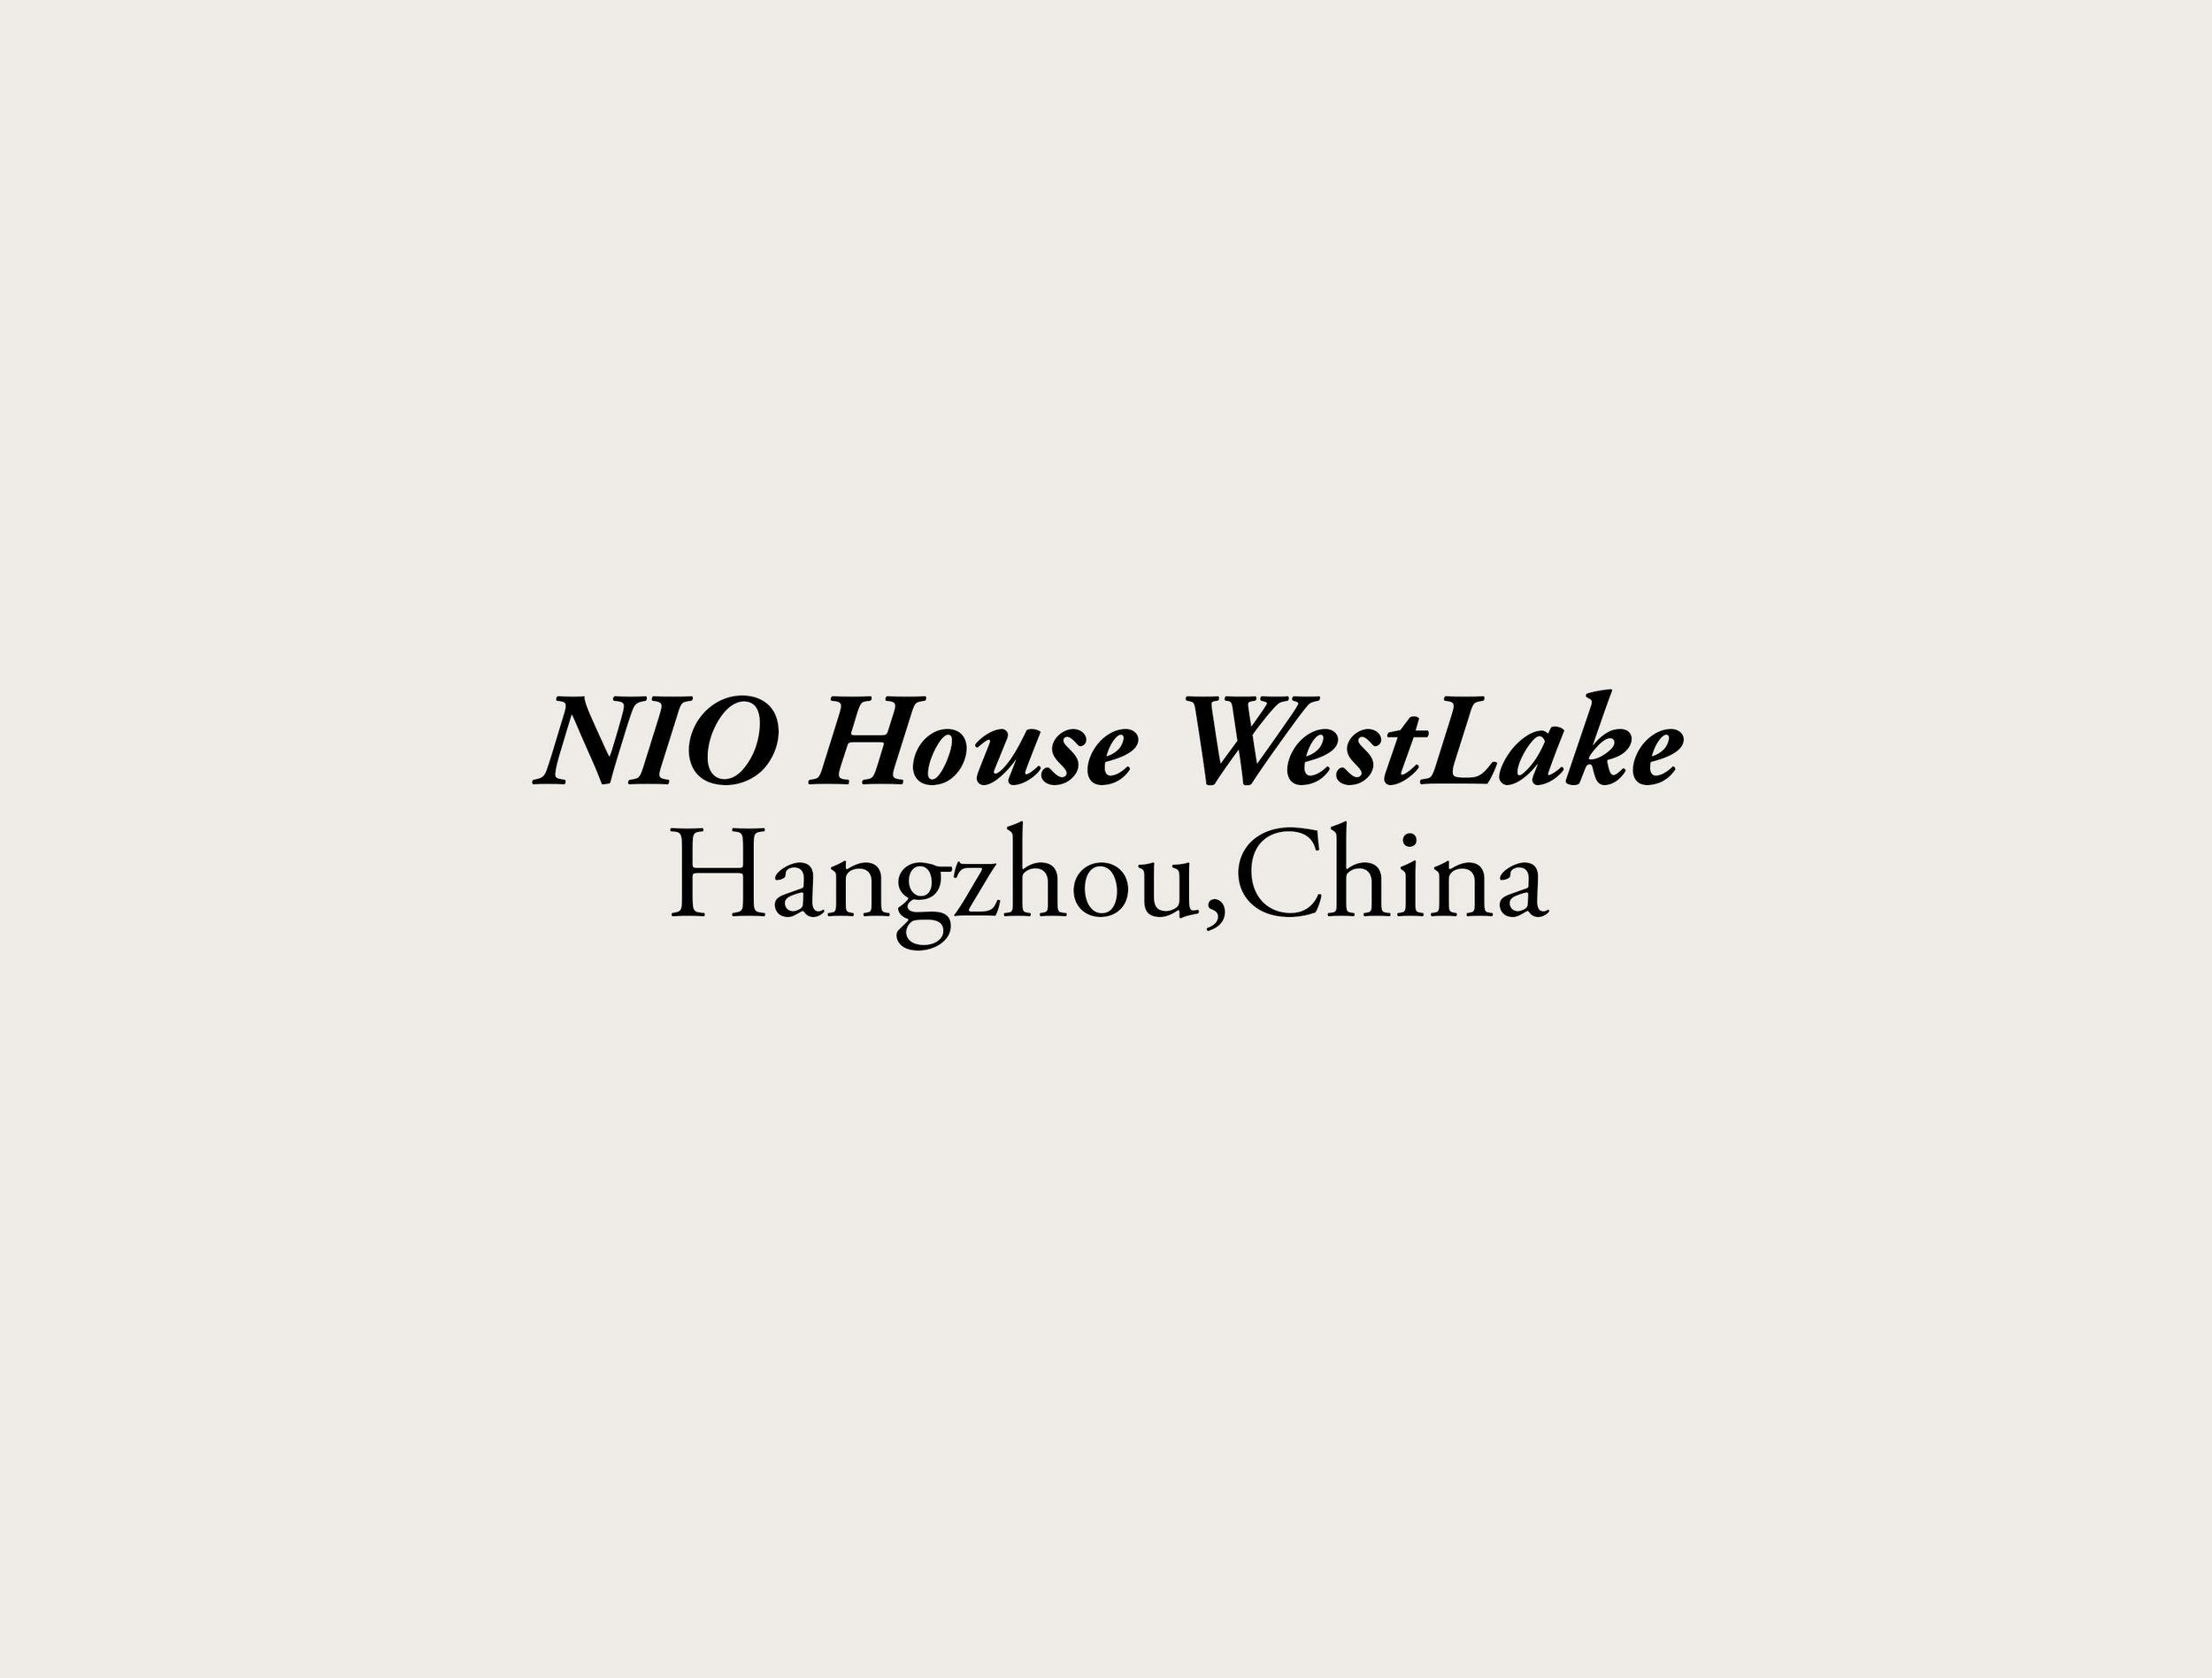 raams-architecture-studio-design-German Roig Garcia-architect-electric-car-coche-electrico-hangzhou-west-lake-nio-house-NIO-Showroom_00.jpg